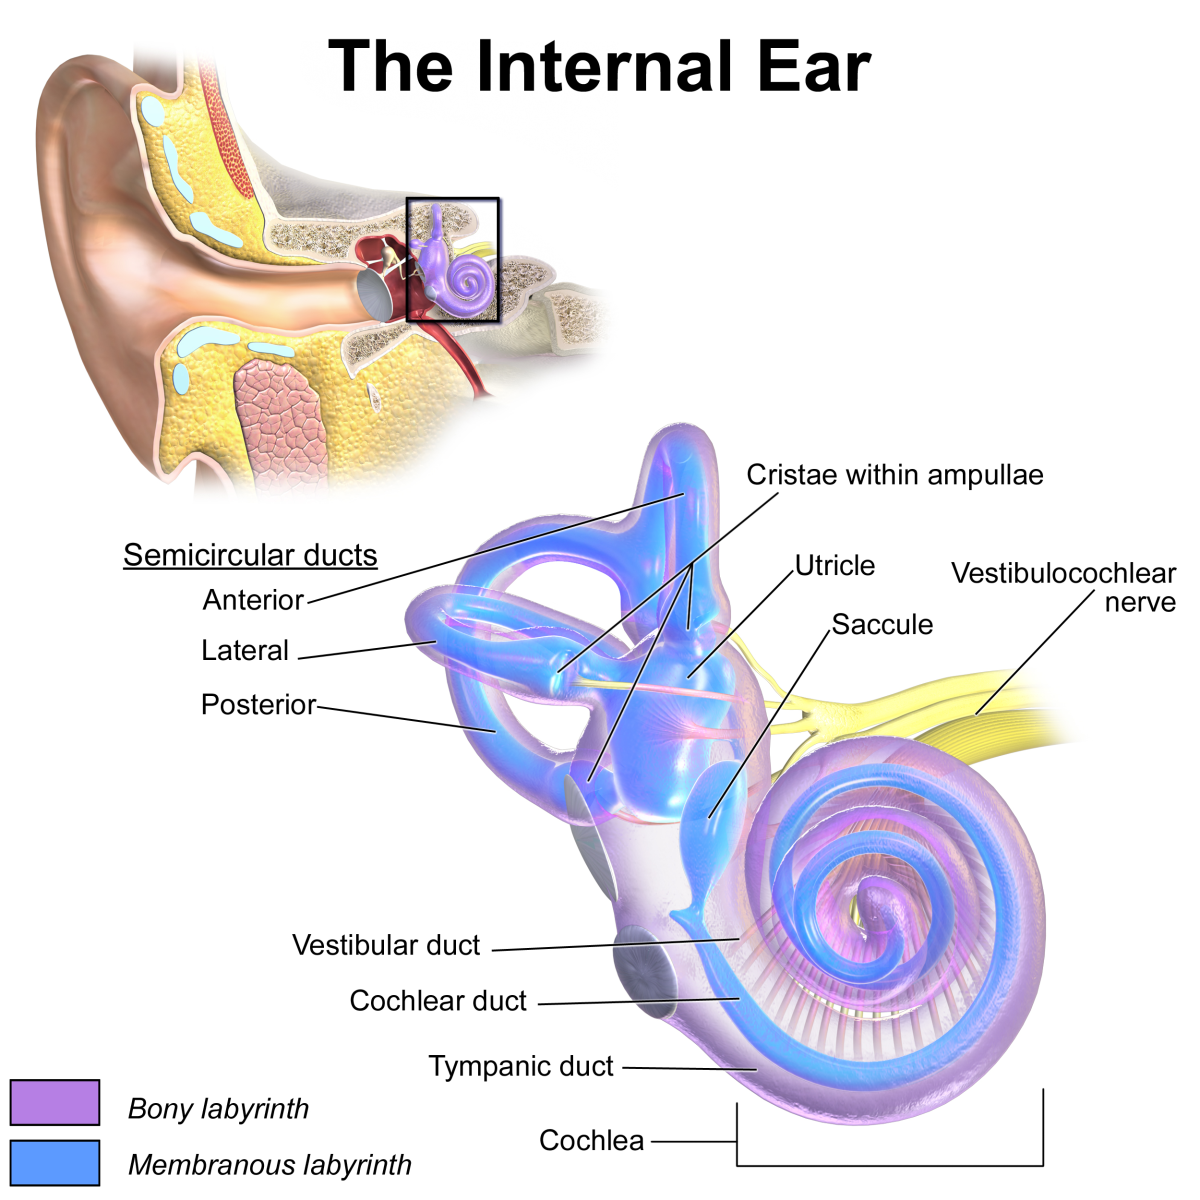 The vestibulocochlear nerve consists of the vestibular nerve and the cochlear (or auditory) nerve.